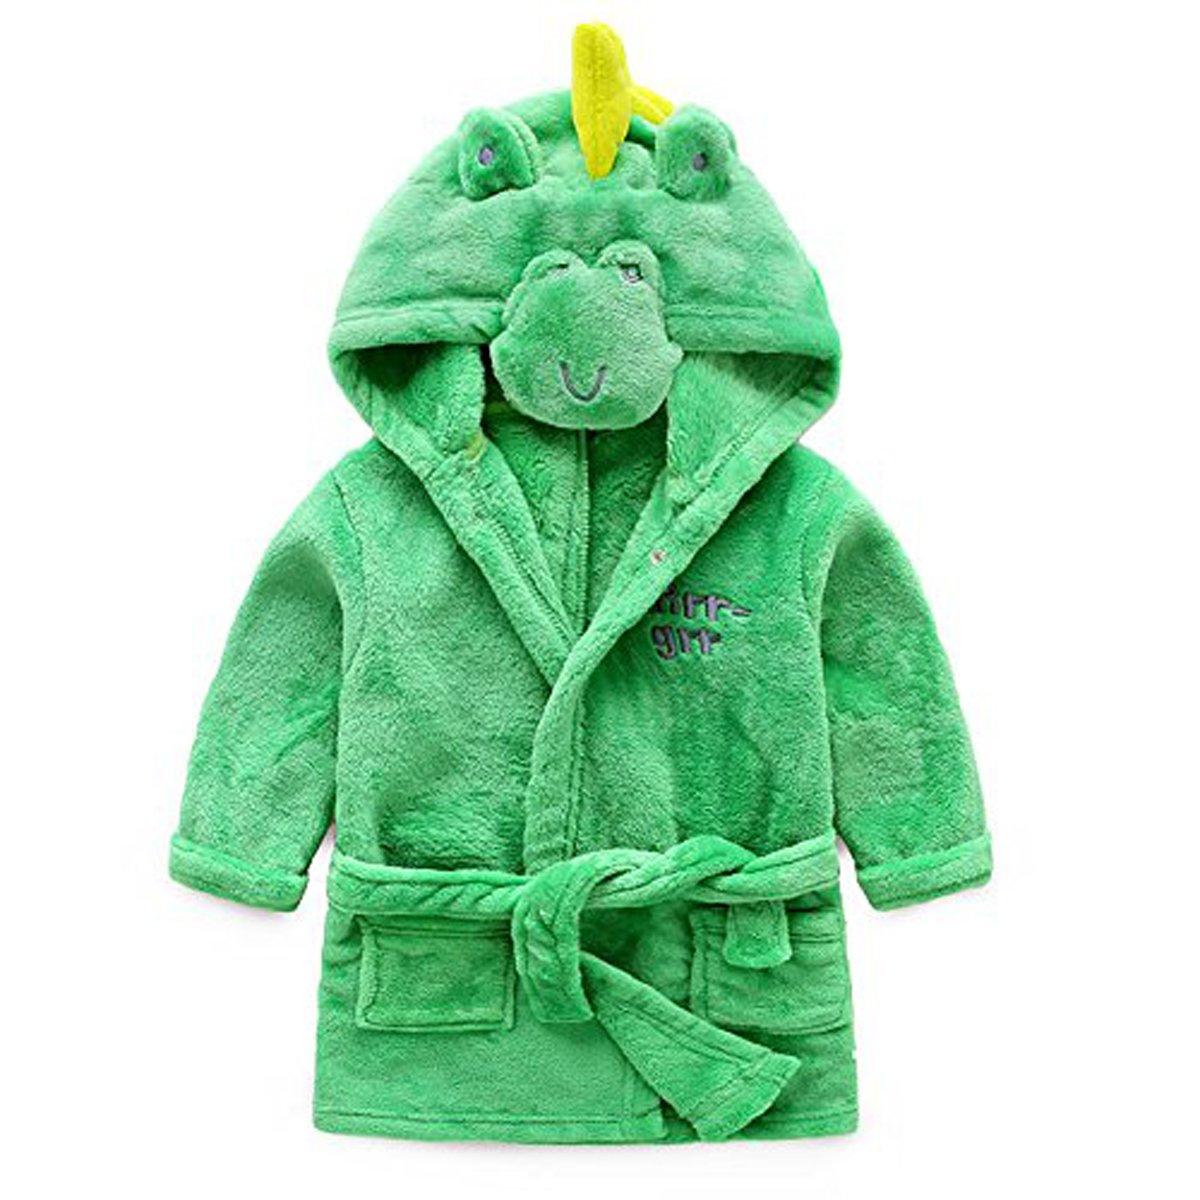 DNggAND Toddler Boy Girl Robes,Children's Bathrobes Robes Pajamas Sleepwear Bath Towel for Boys Girls Kids Toddlers